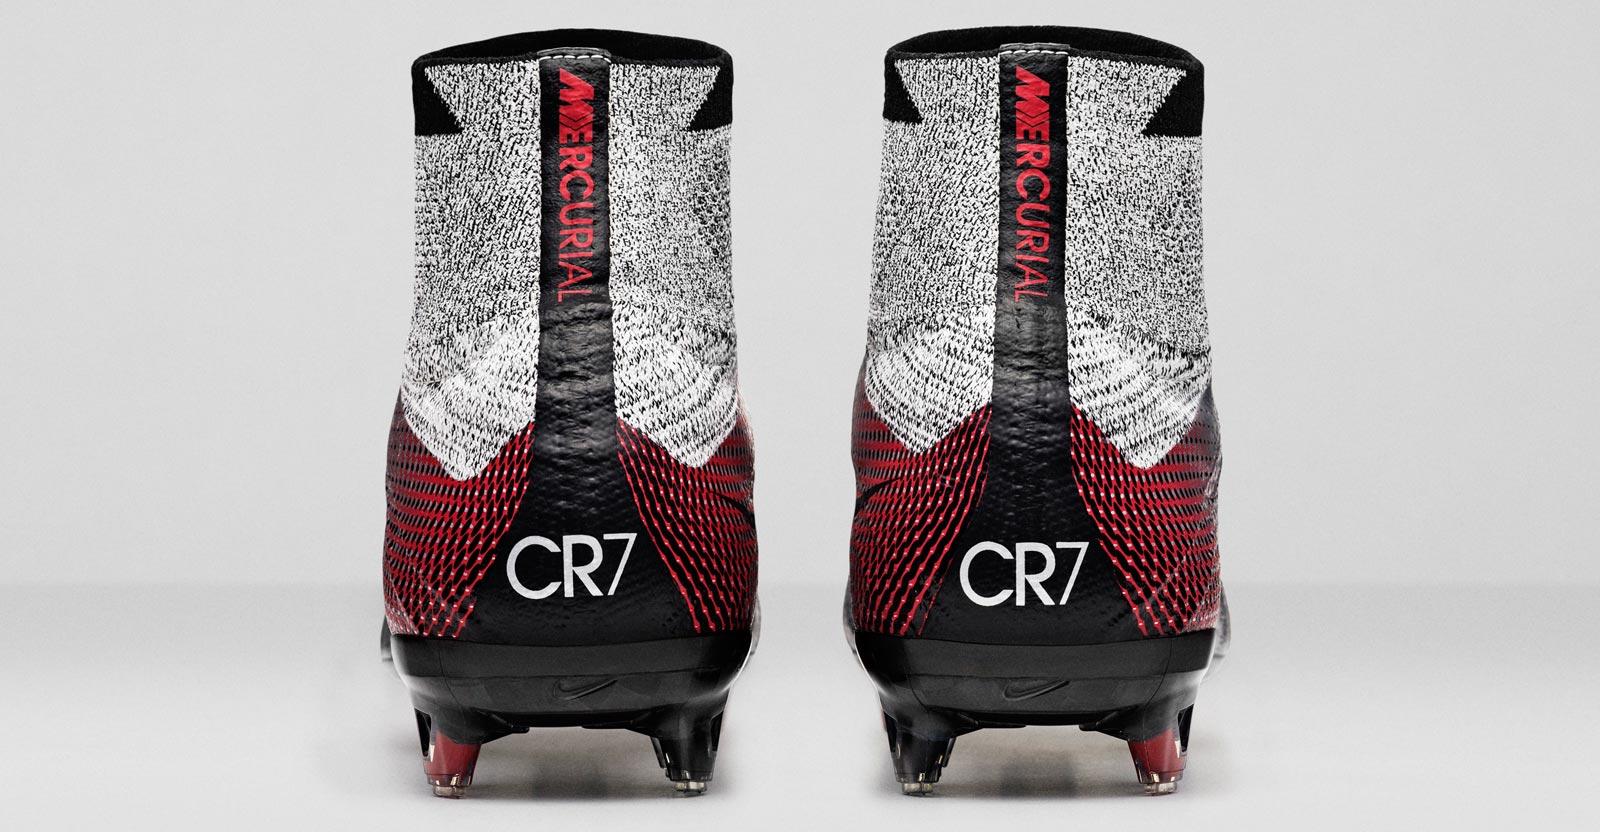 Nike Mercurial Superfly Cr7 2017